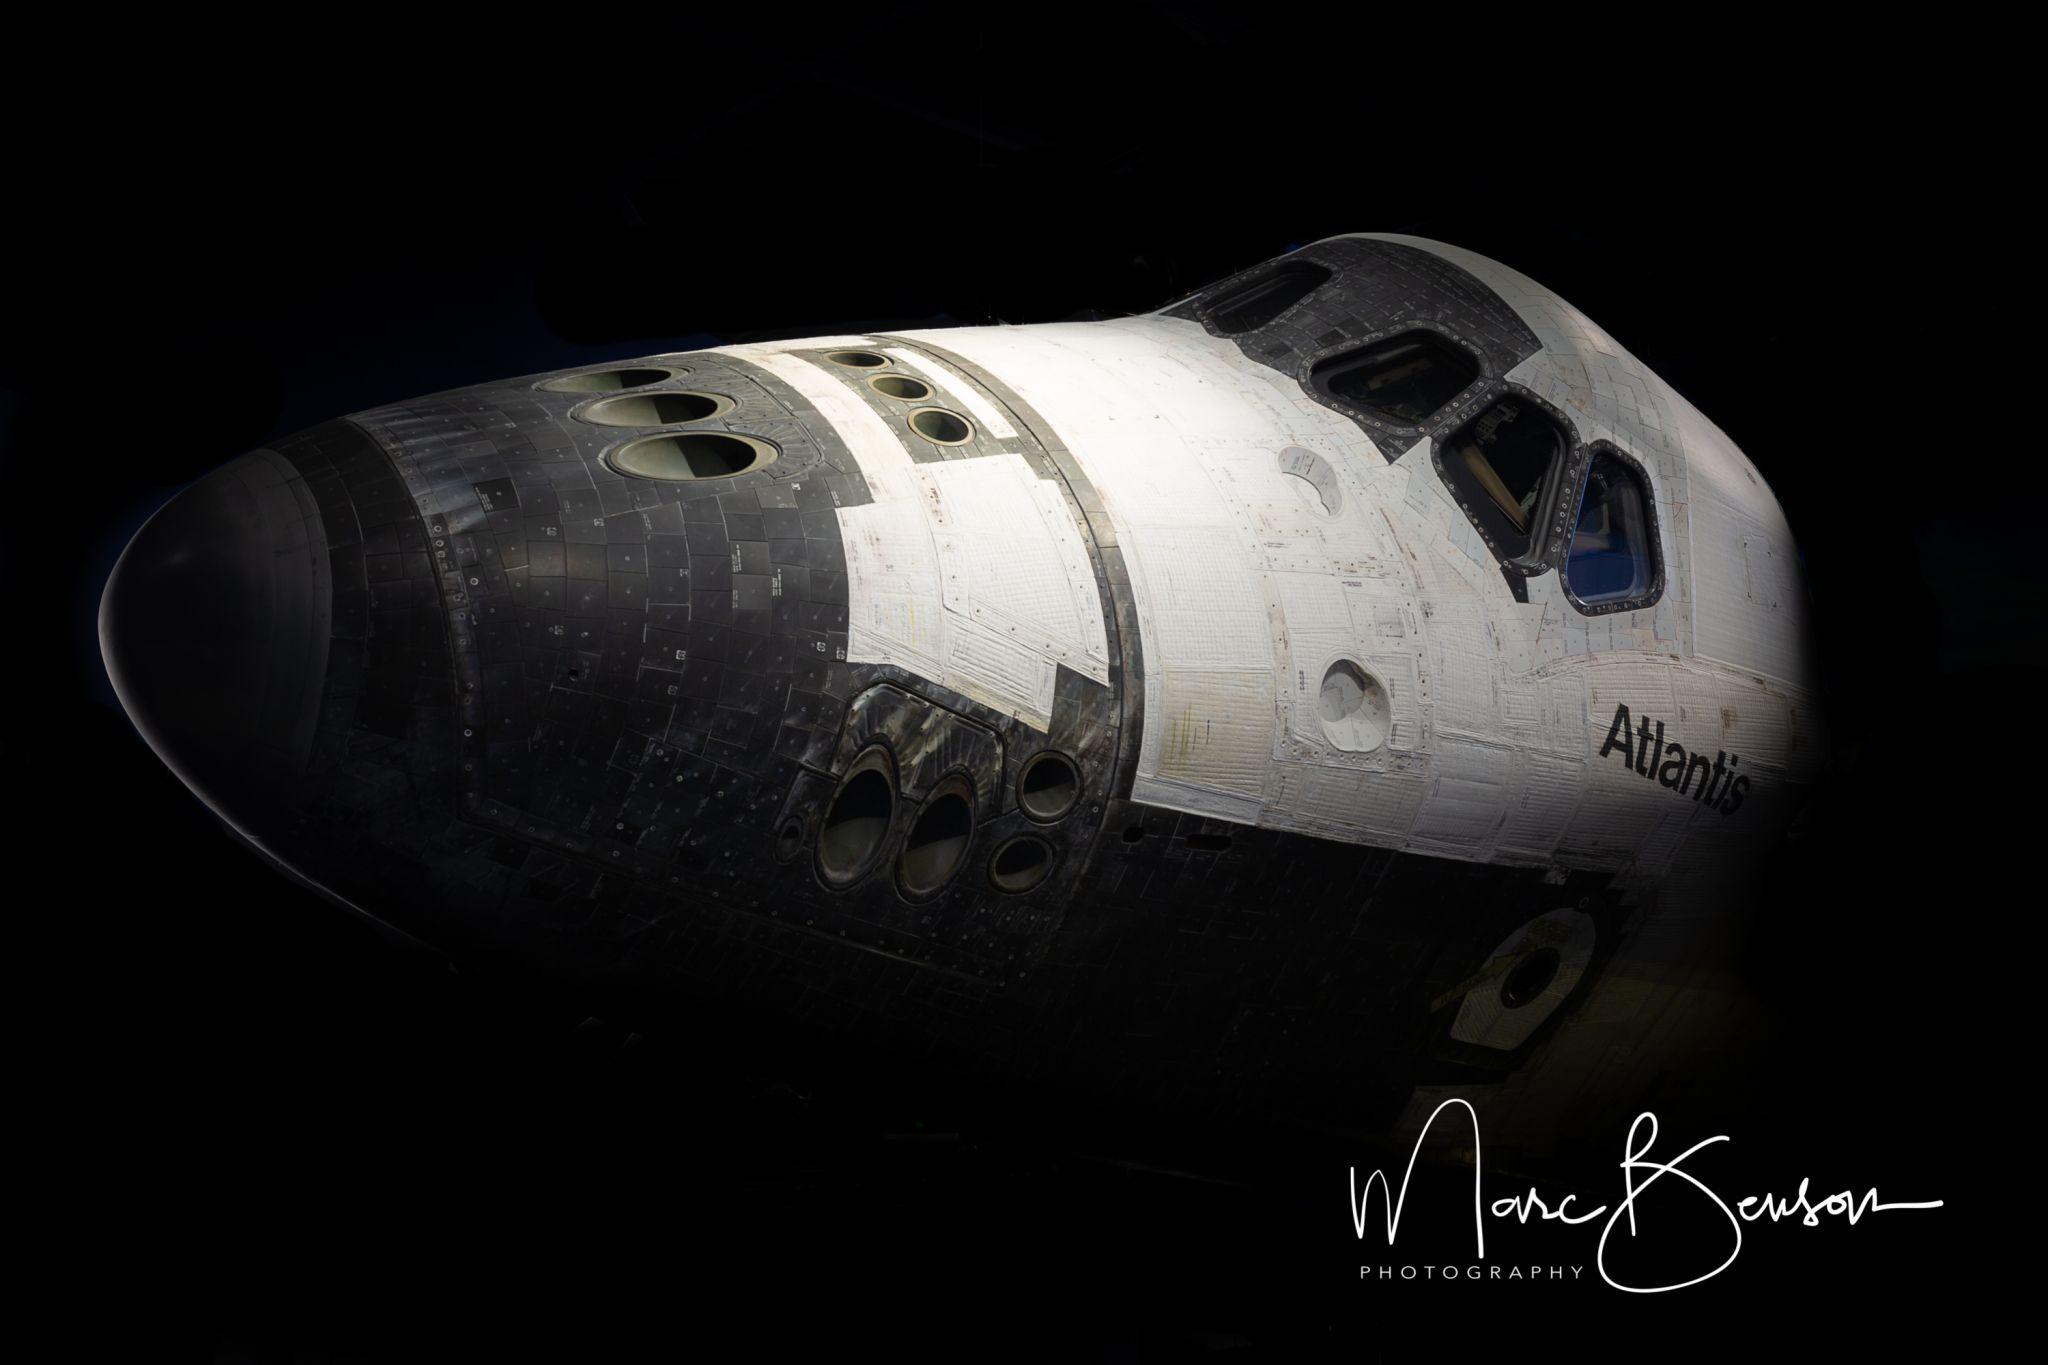 Atlantis exhibit at Kennedy Space Center, USA